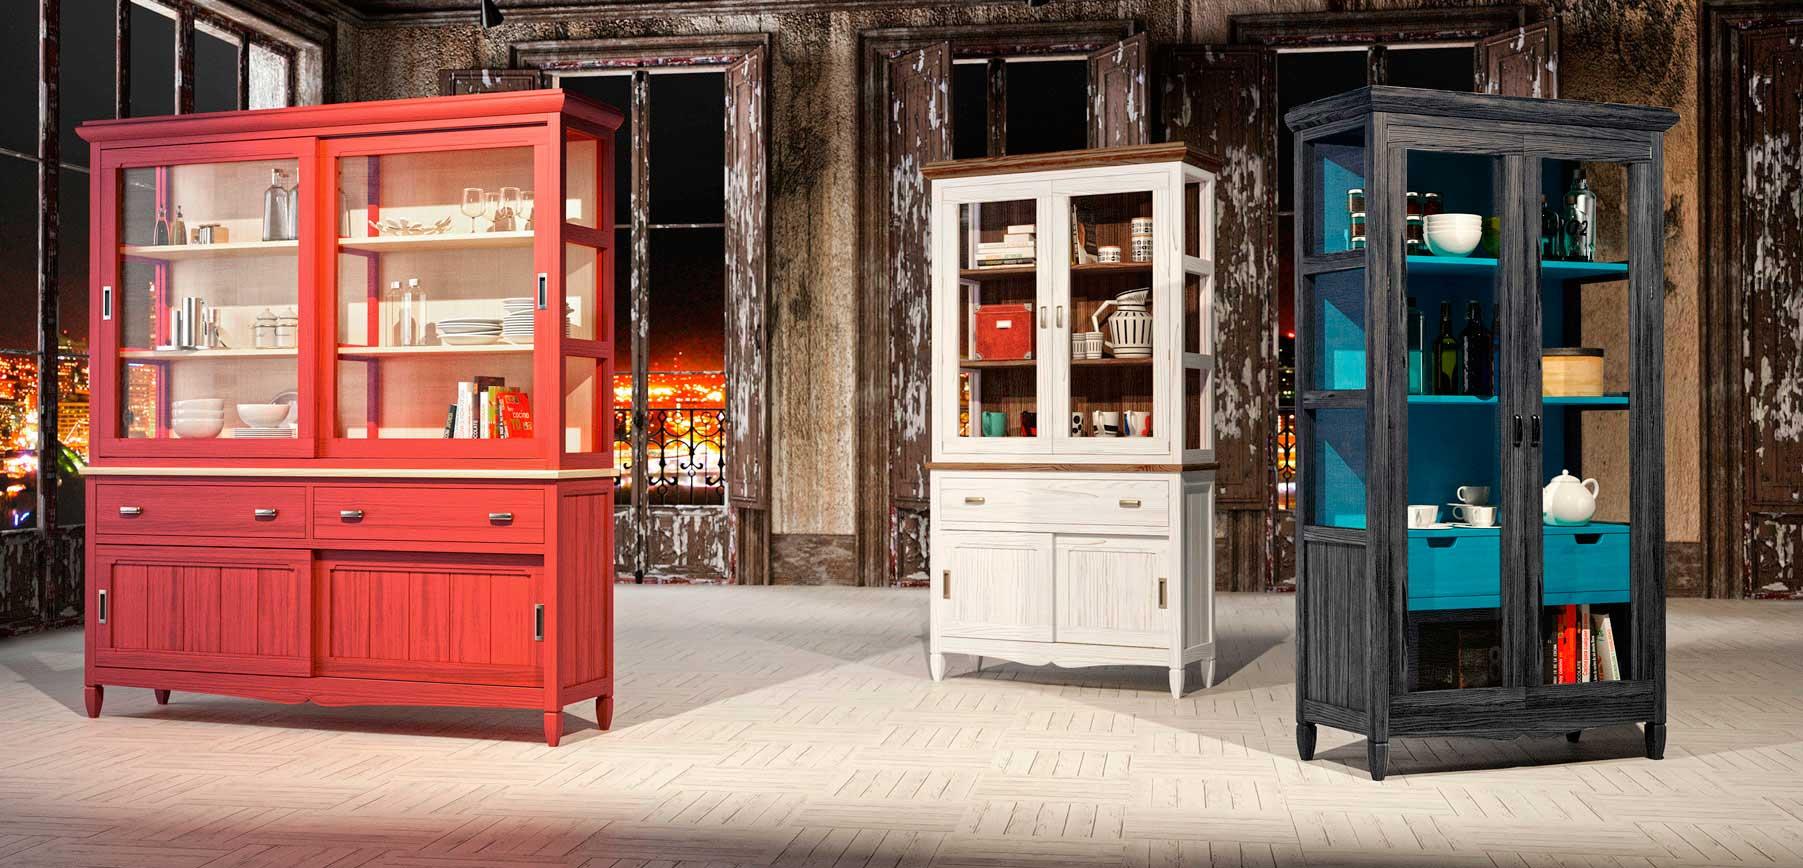 Muebles GRUPOSEYS - Muebles | Furniture | Meubles | мебель seys-1-optim-1 Inicio